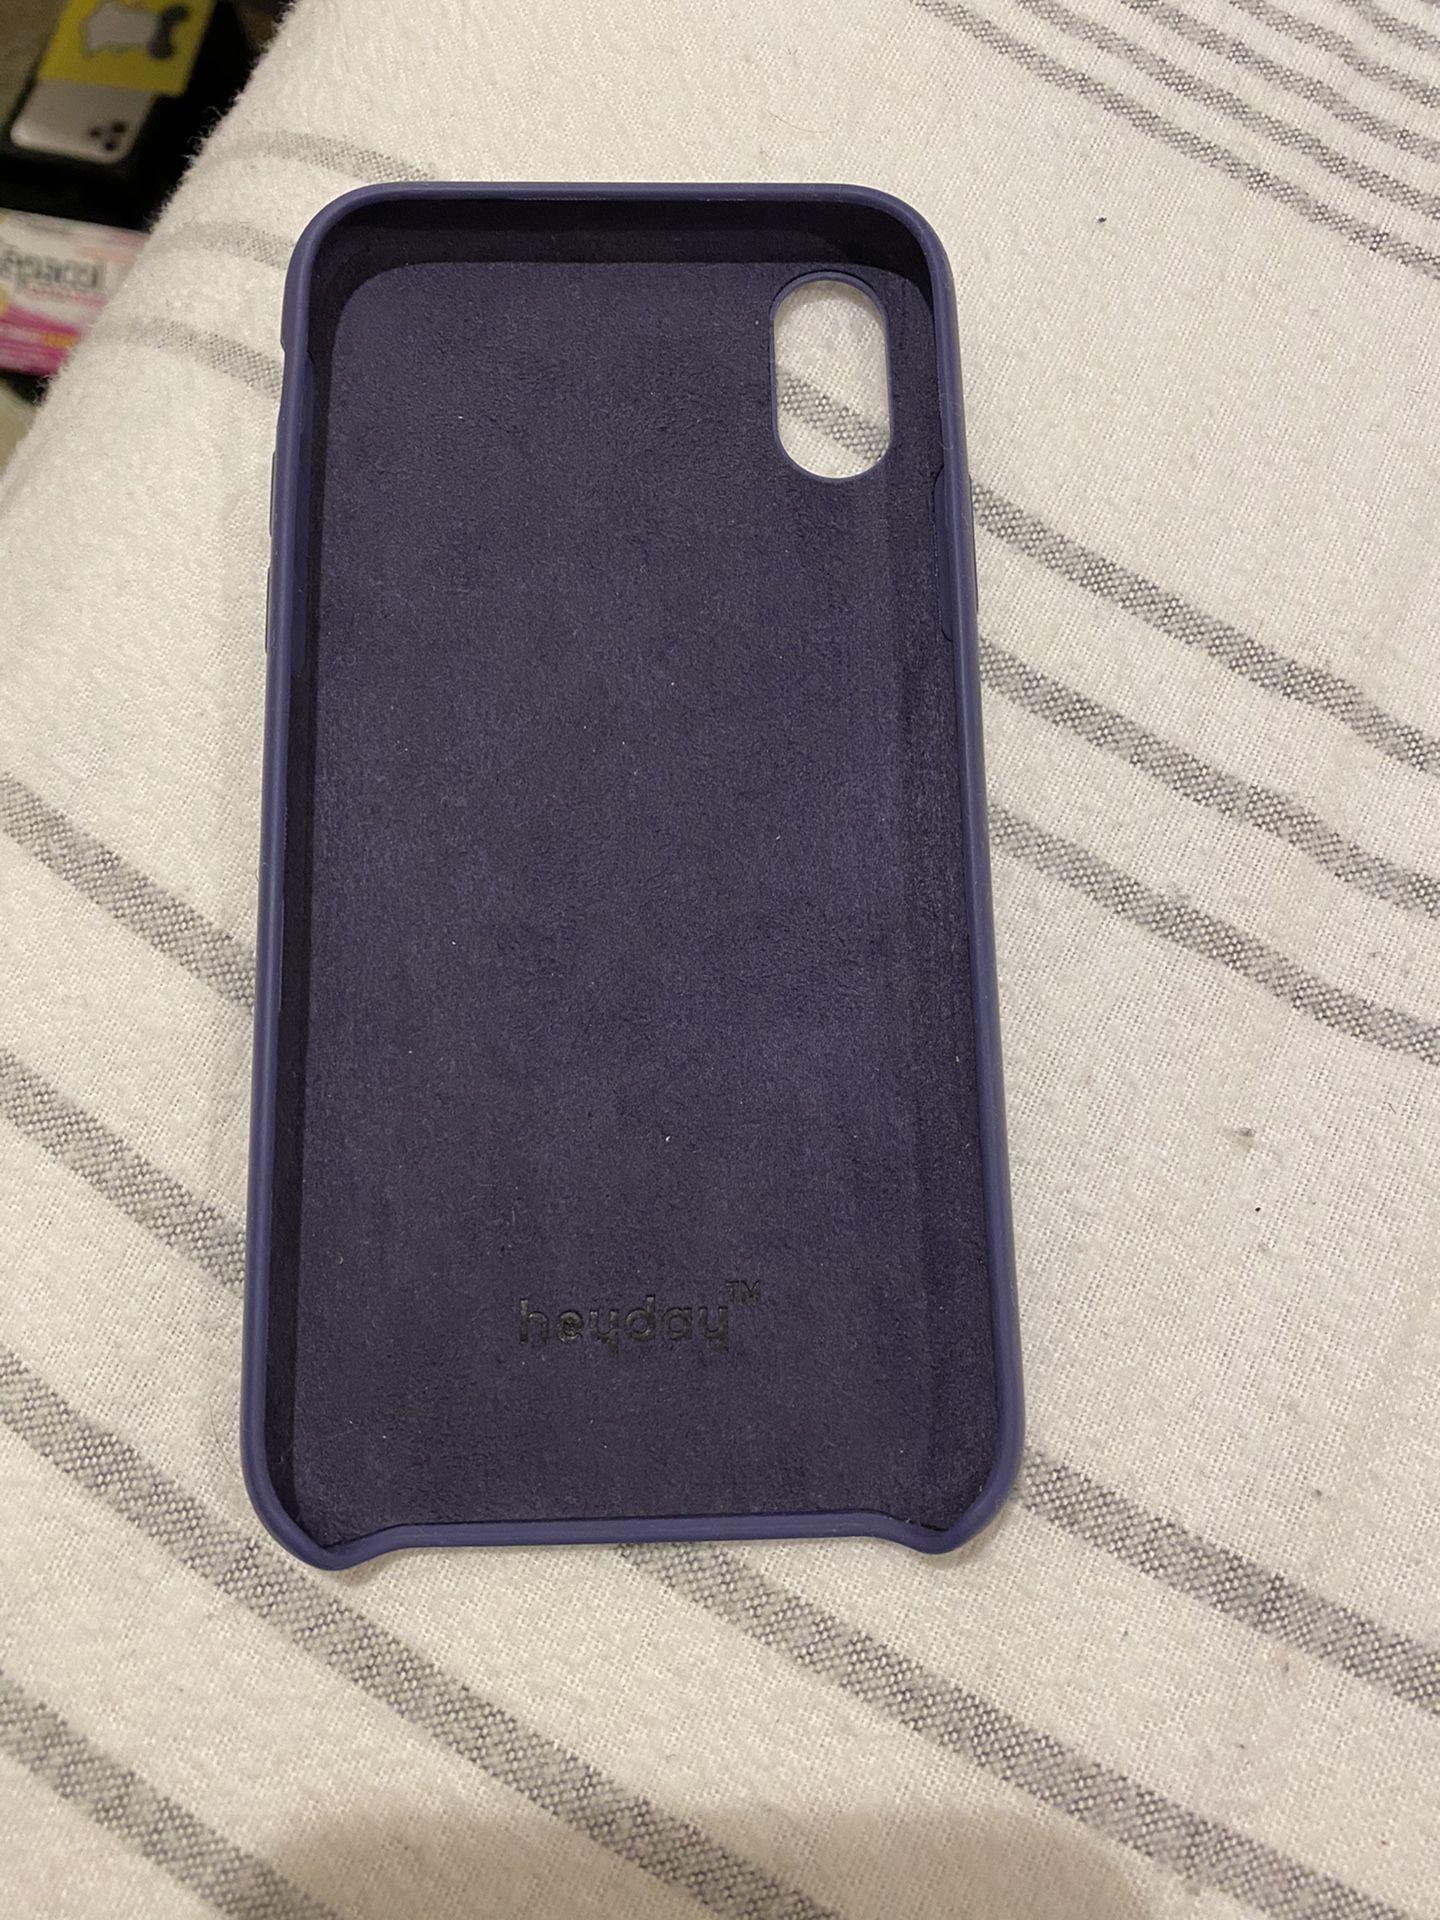 Silicon iPhone X Case